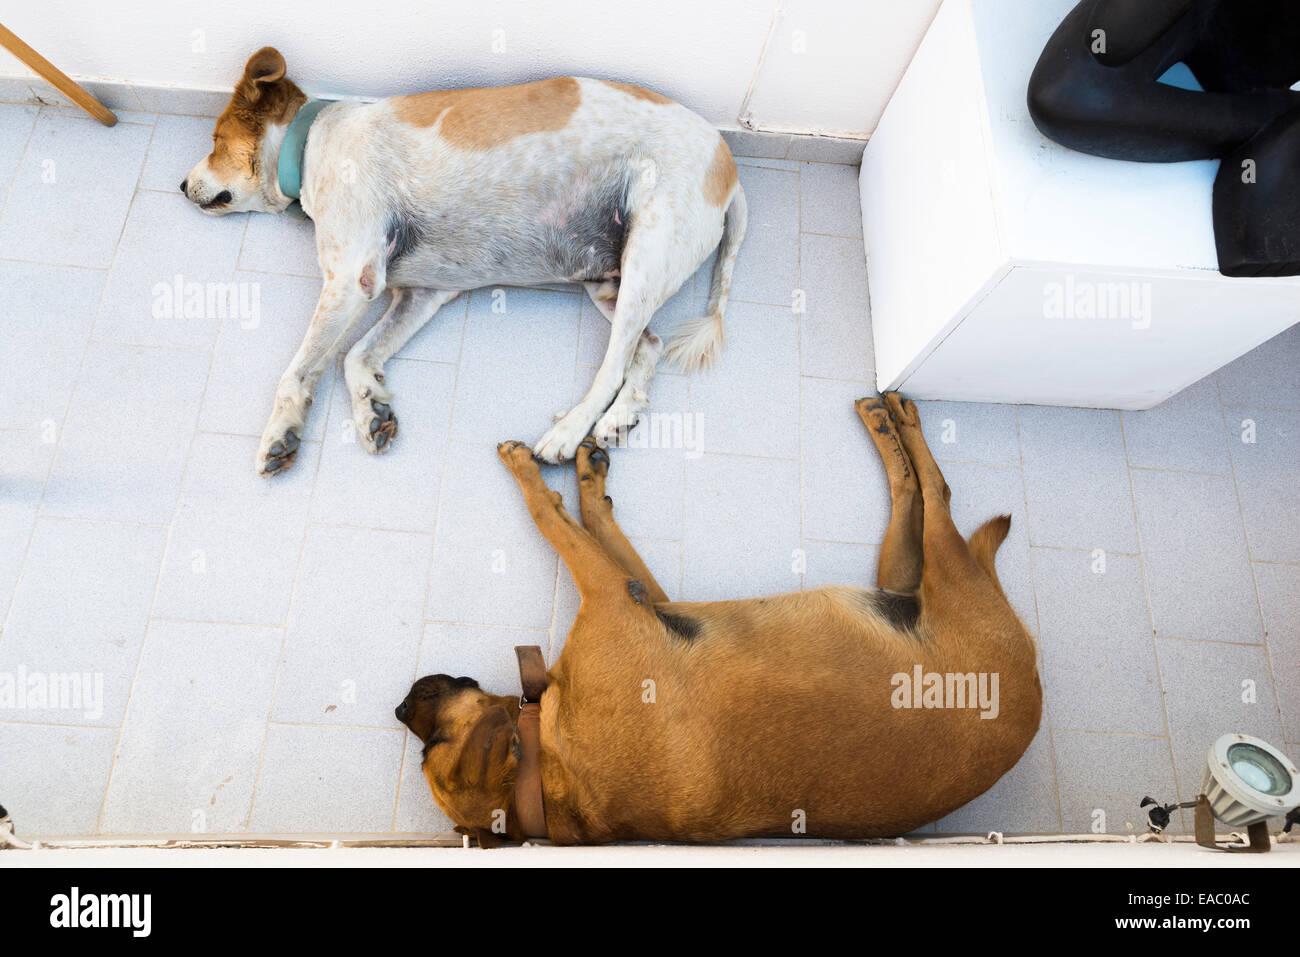 Two sleeping dogs, Oia, Santorini, Greece - Stock Image